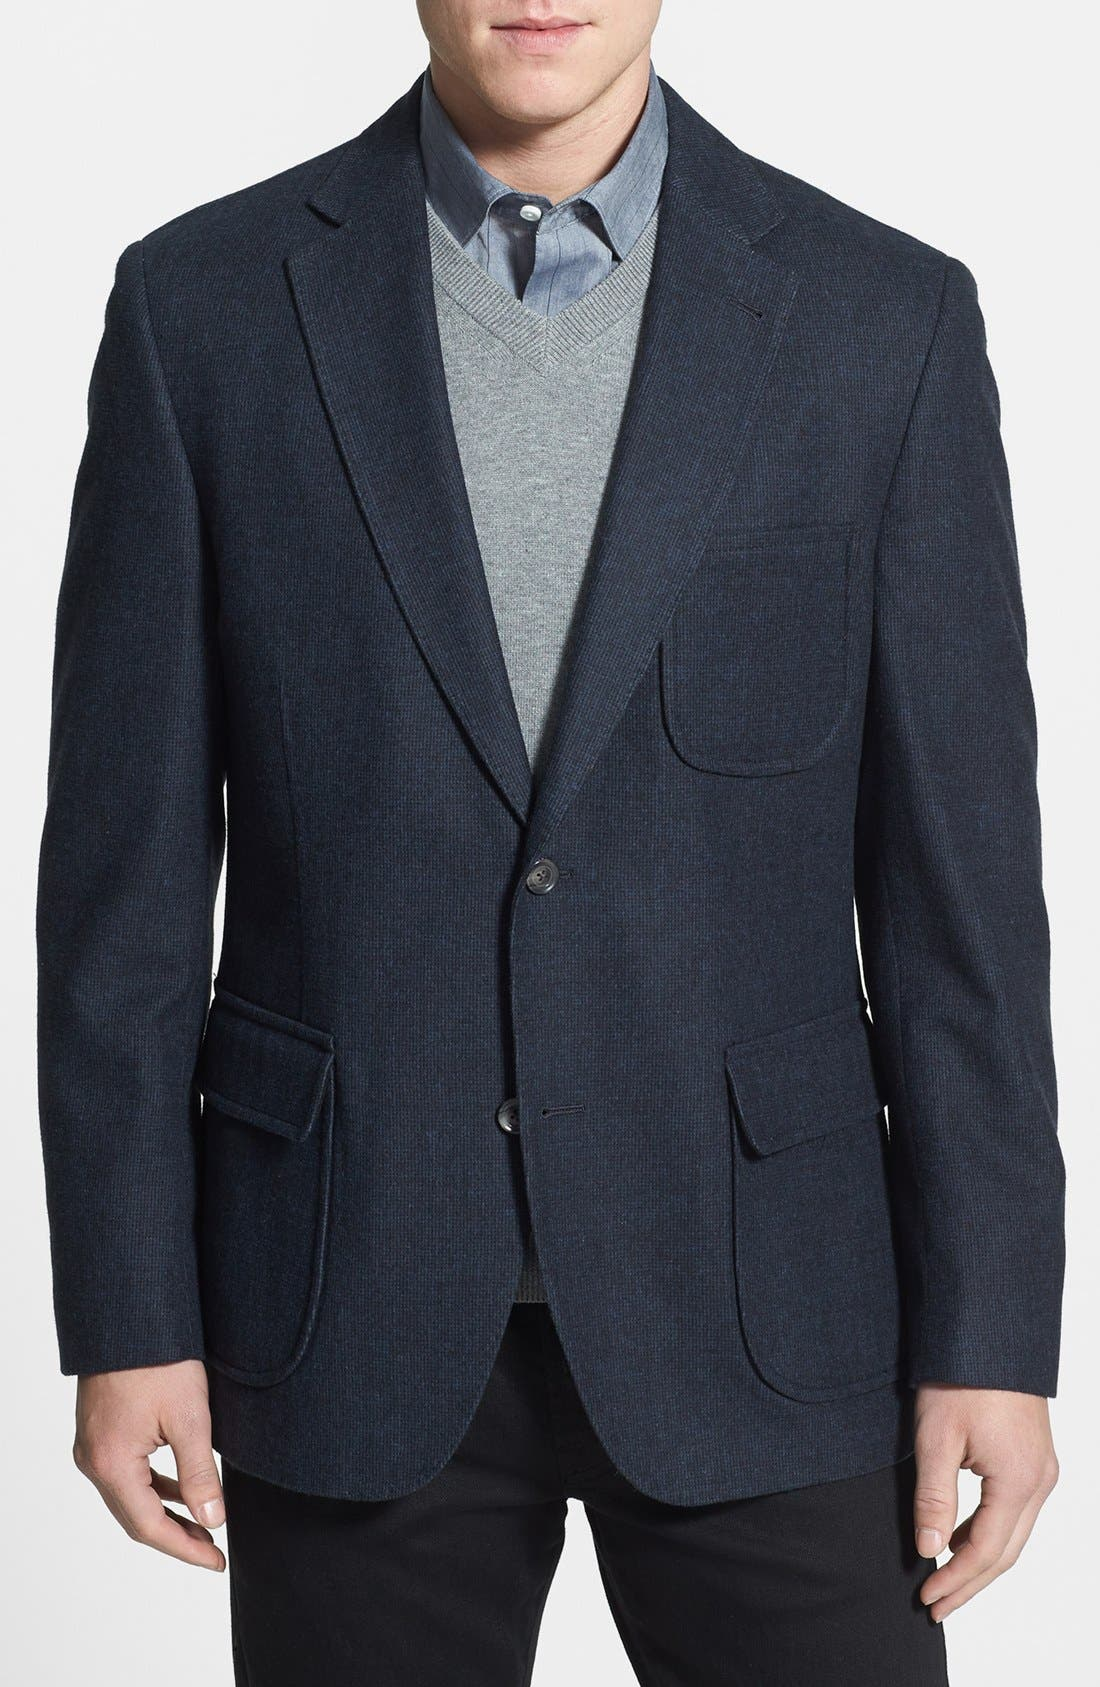 Main Image - Kroon Wool Blend Sportcoat